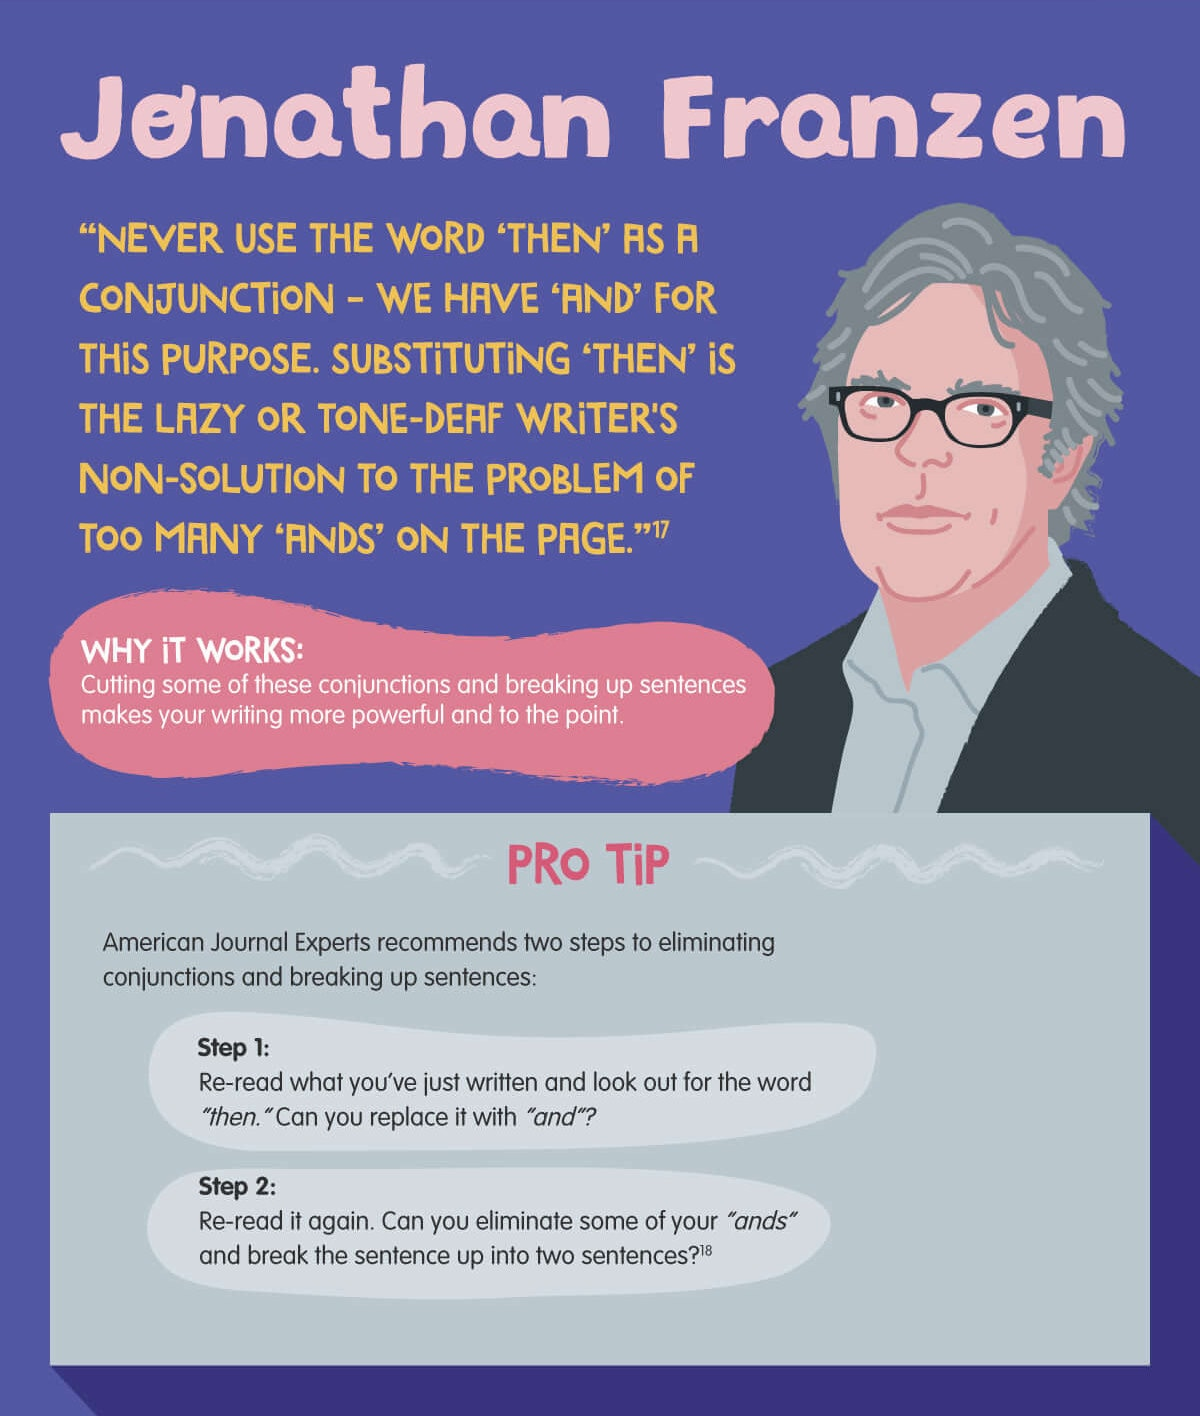 Writing advice from Jonathan Franzen